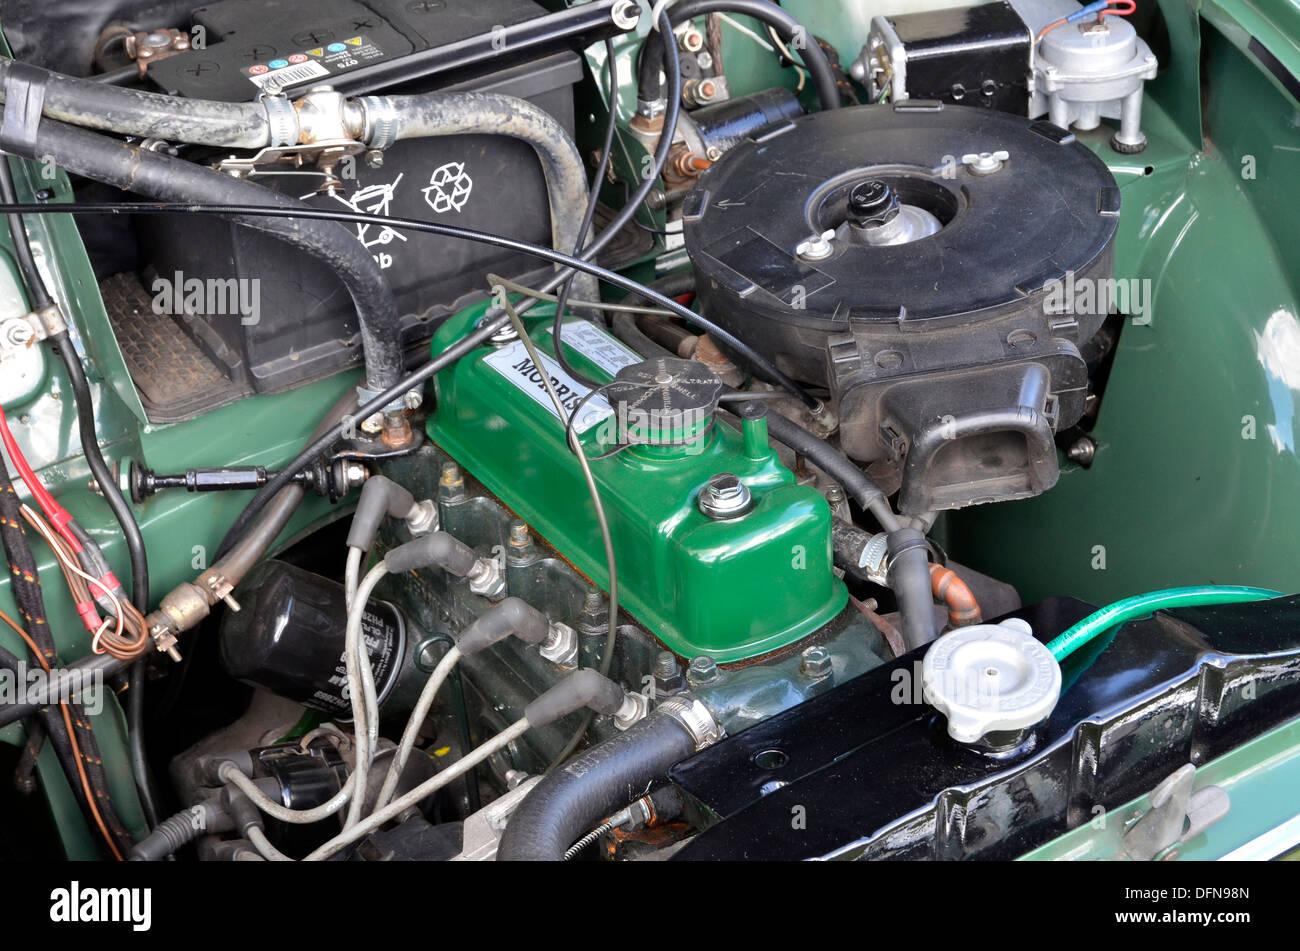 Morris Minor Wiring Diagram Engine Bay Of 1960 S Morris Minor Saloon Showing Bmc A